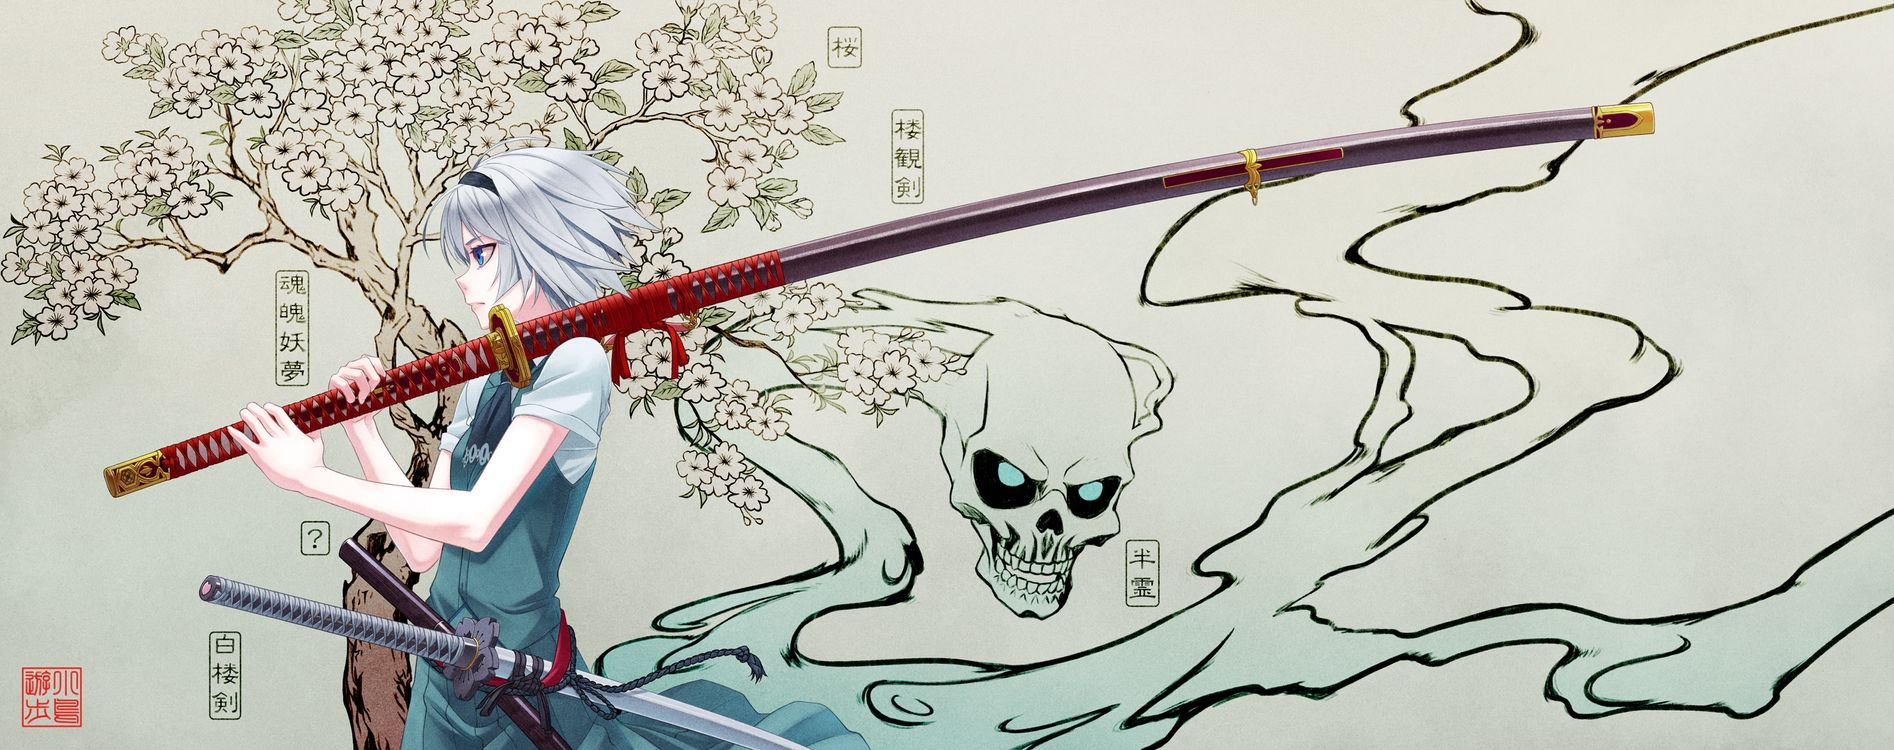 Photo an anime anime girl katana - free pictures on Fonwall